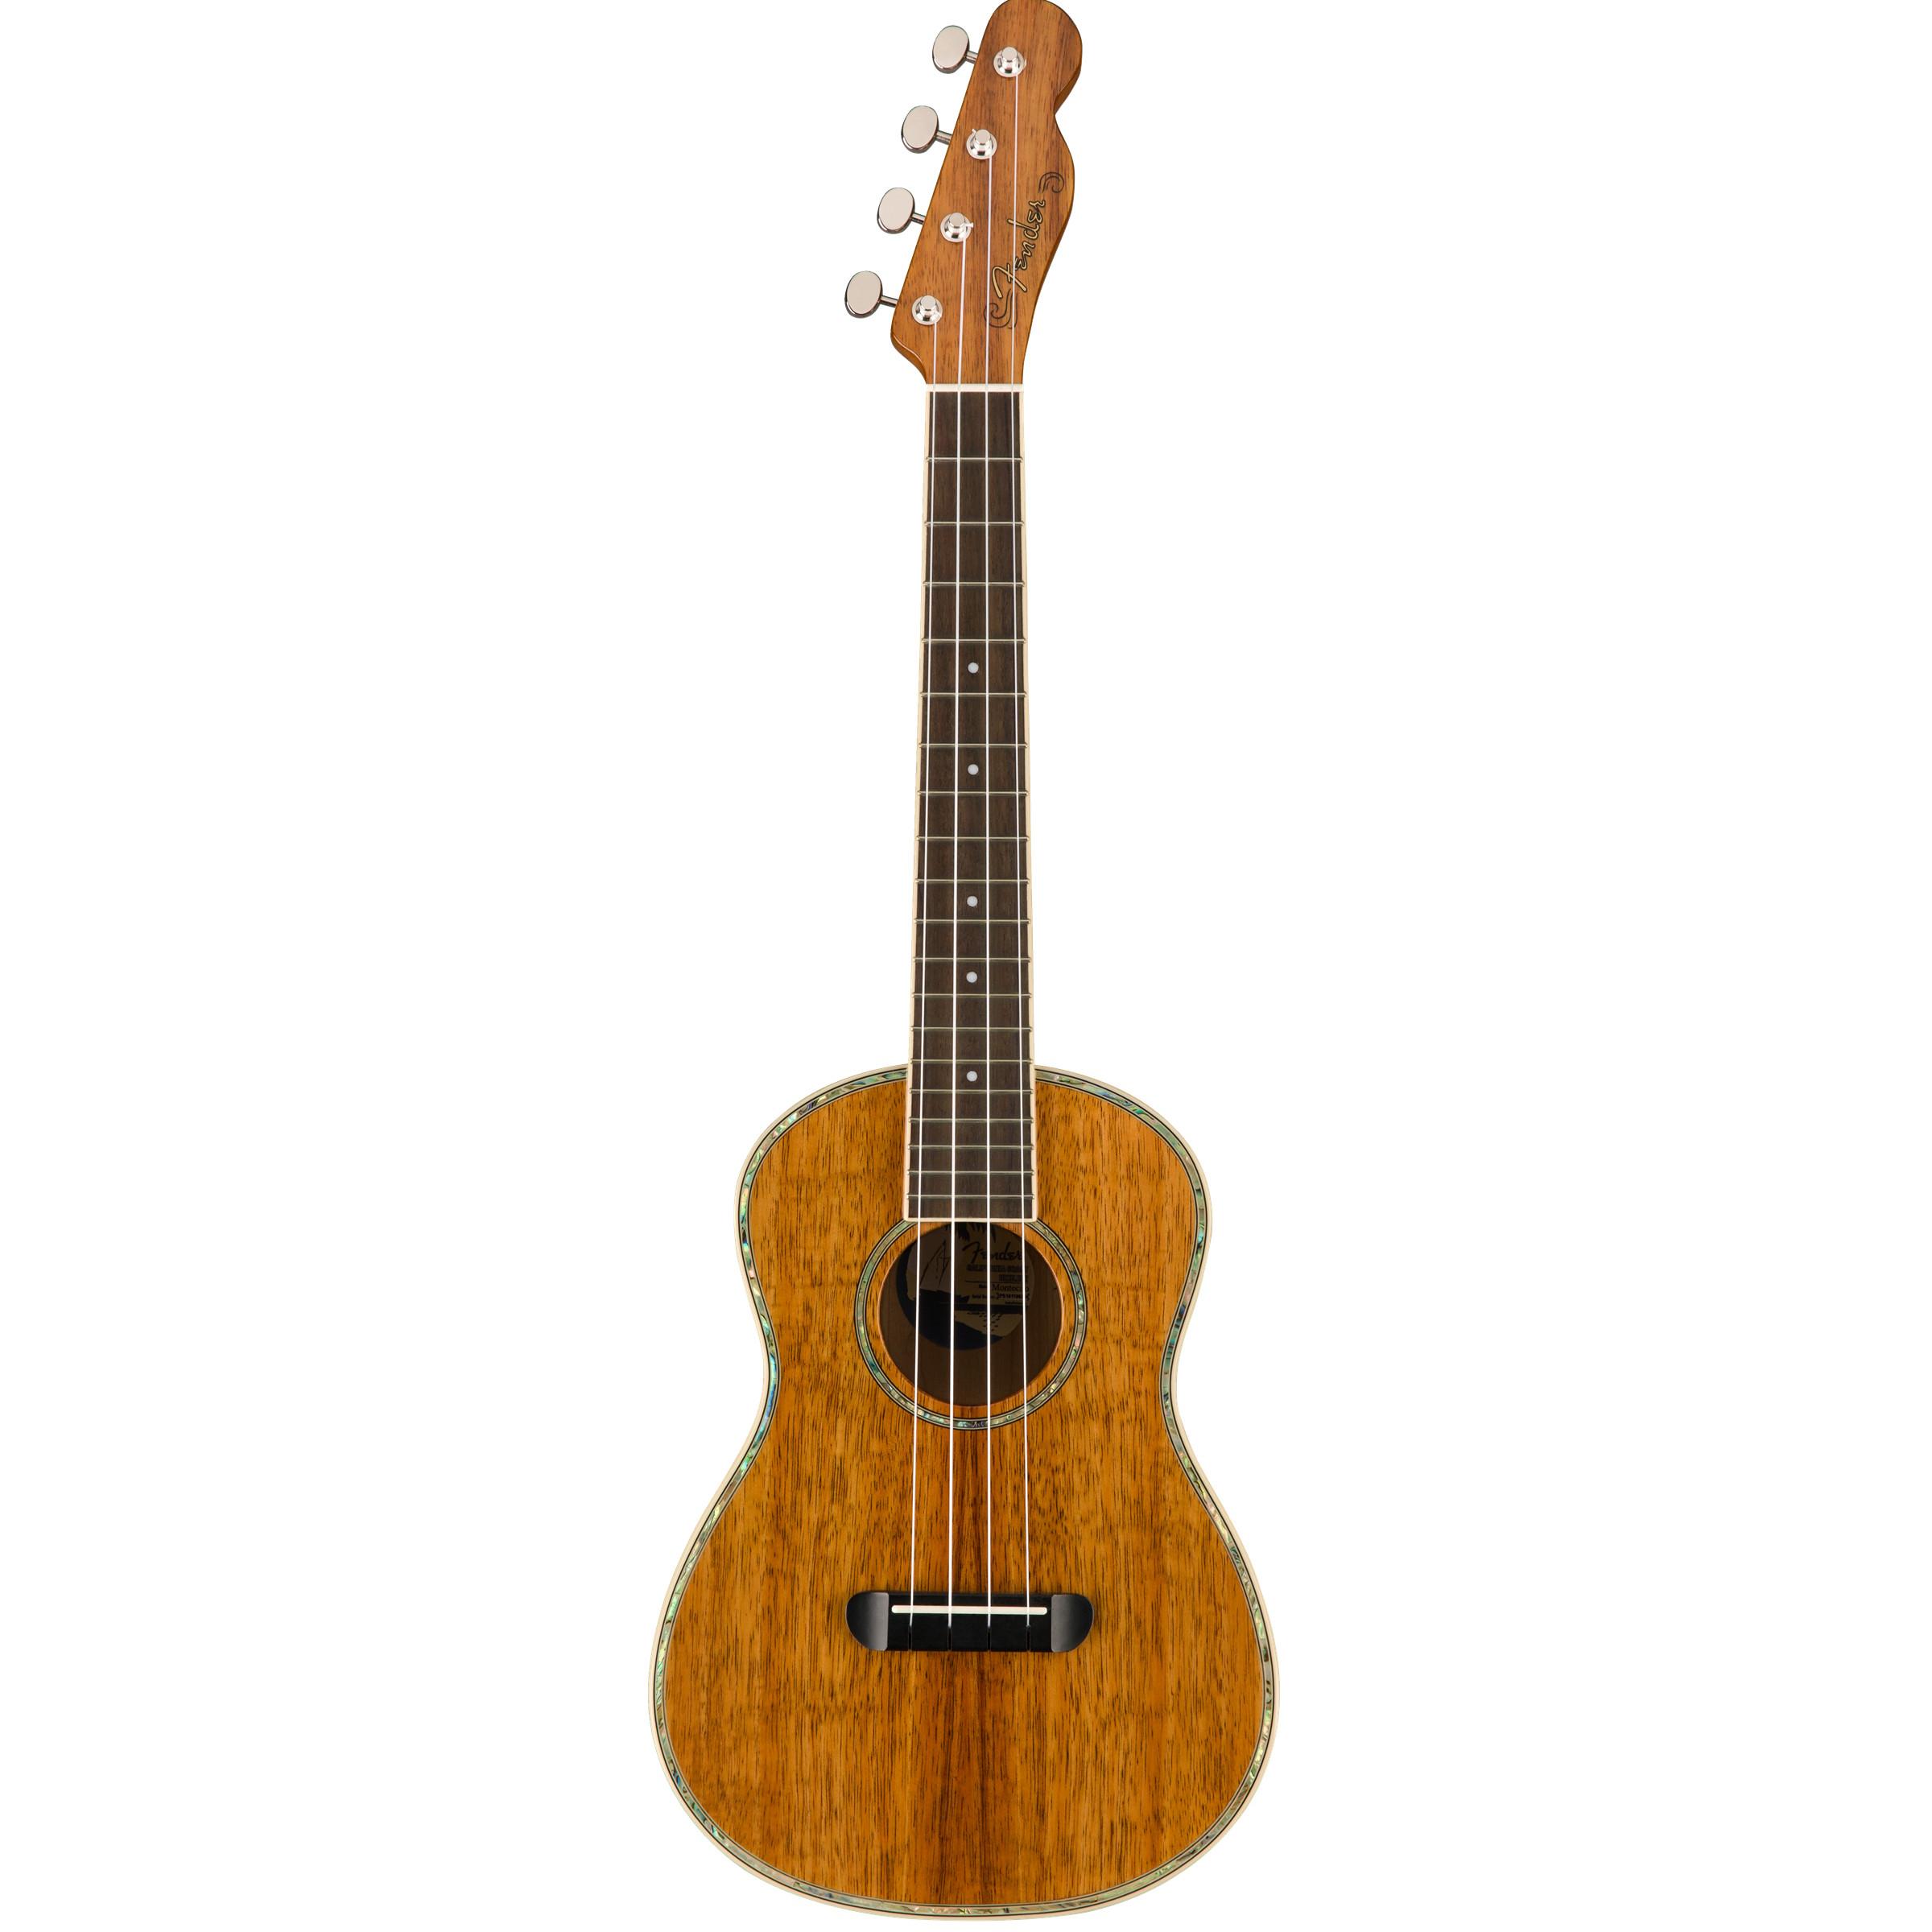 Fender Montecito Tenor Ukulele inklusive Tasche